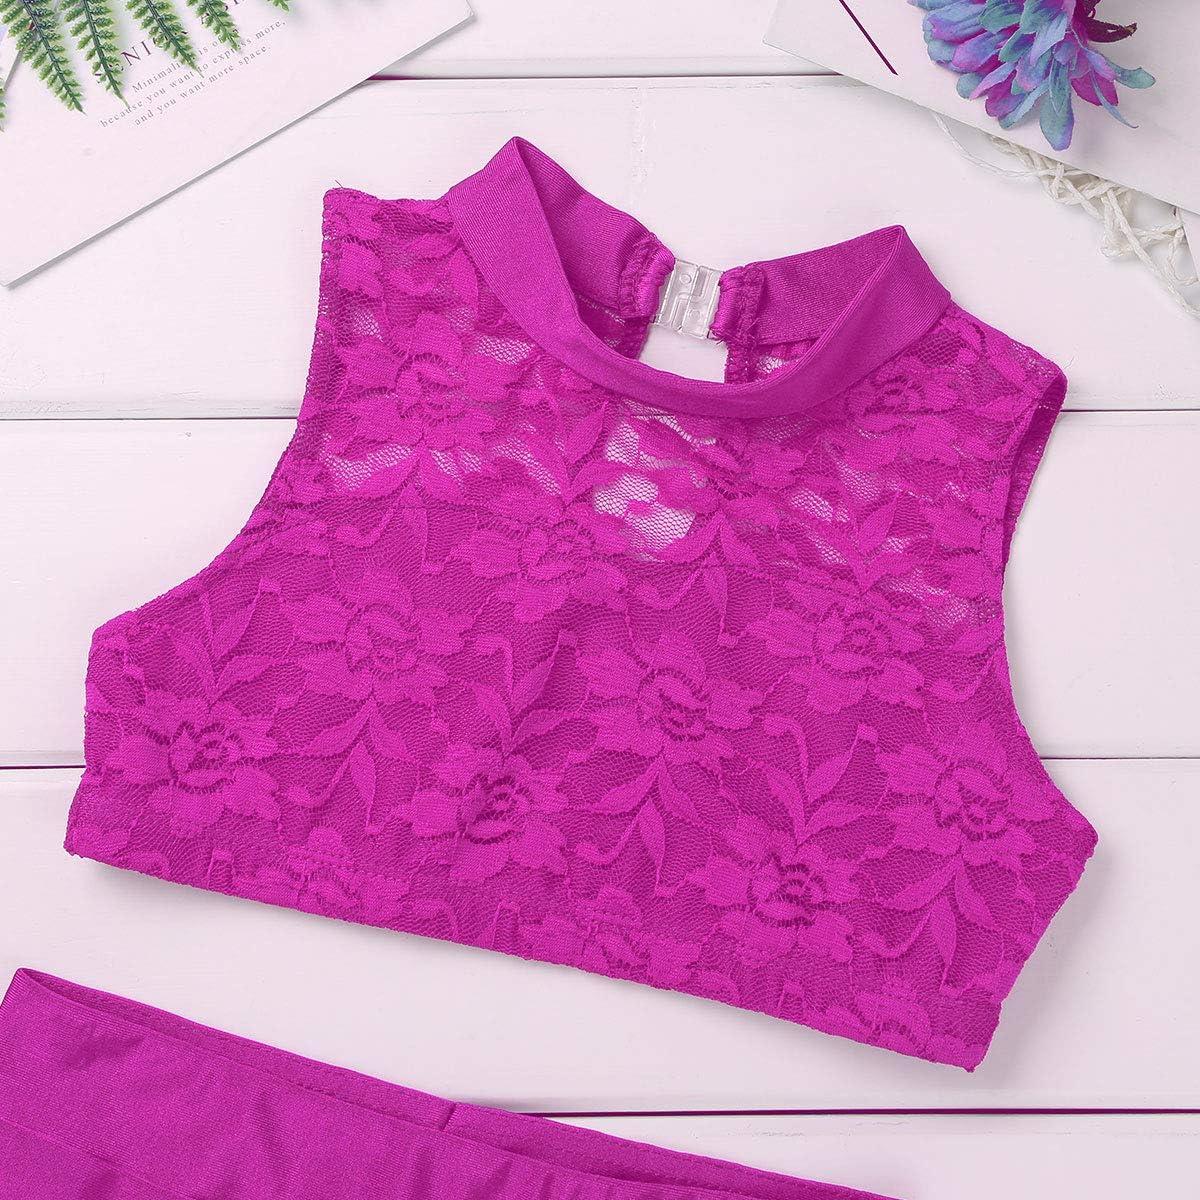 Zaldita Big Girls Floral Lace Tracksuit Solid Mock Neck Crop Top with Booty Shorts Gymnastics Leotard Ballet Dance Costume